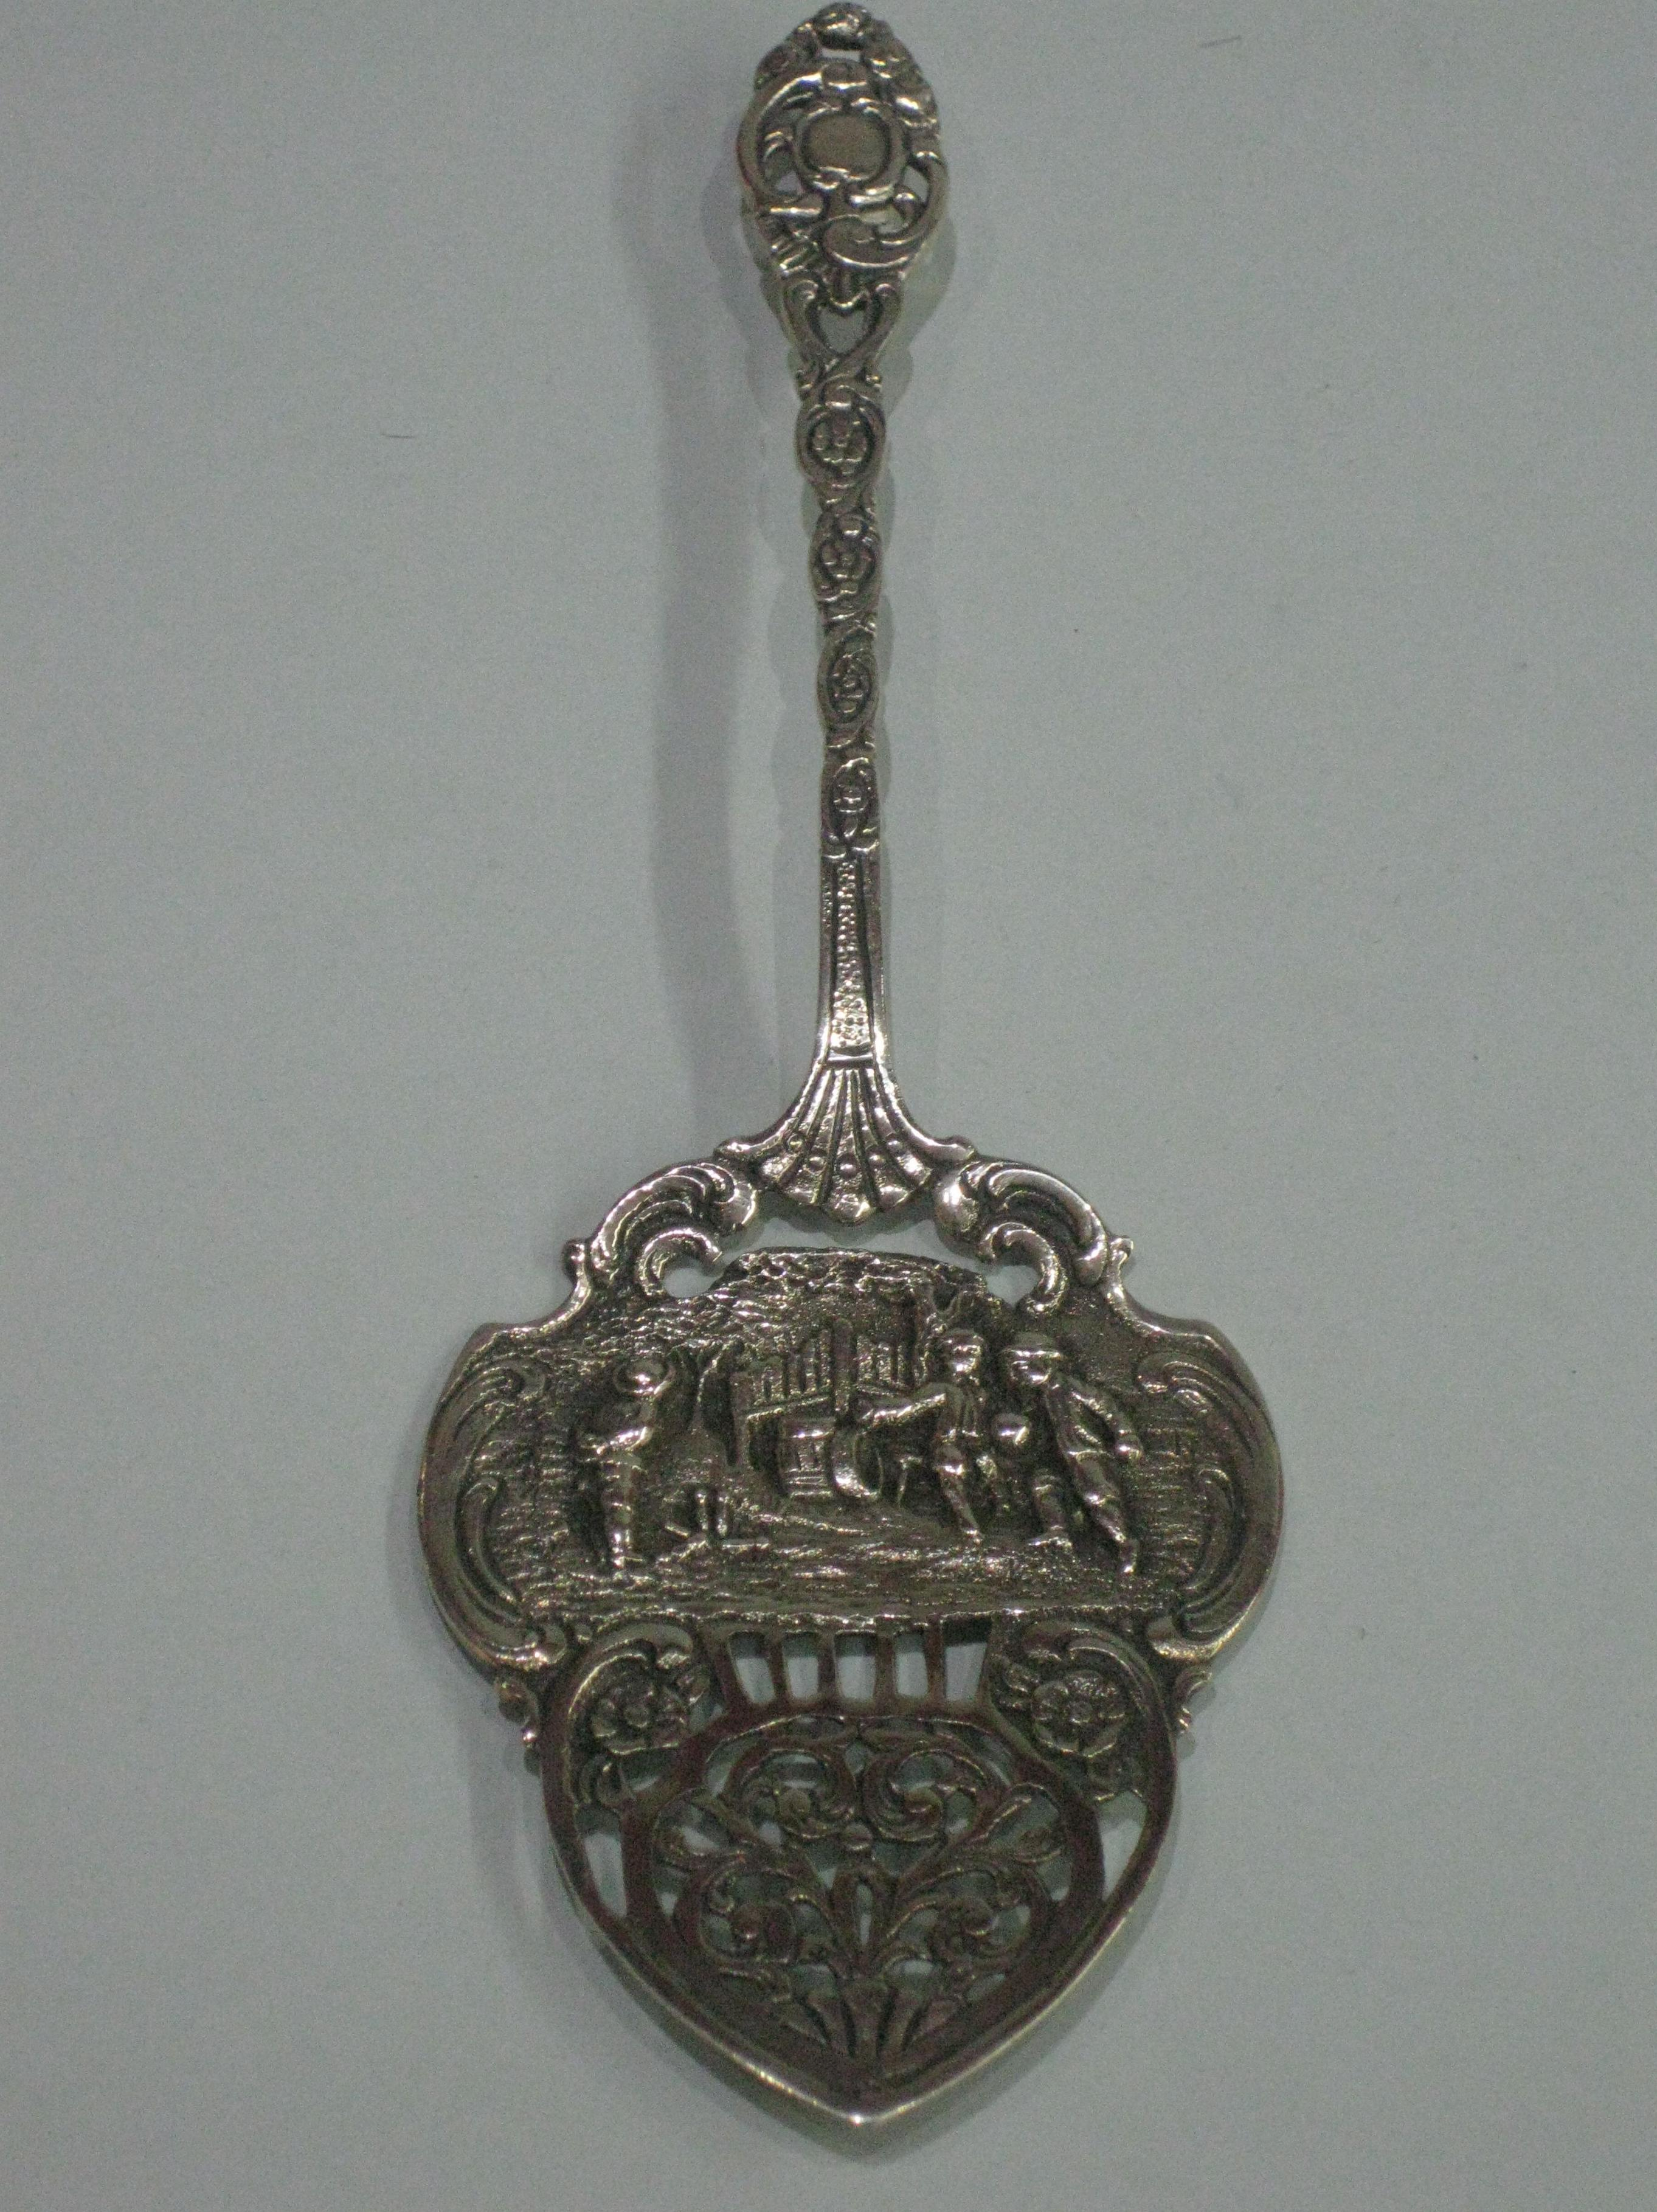 PALA TARTA: Catalogo de plata de Vera Orfebre